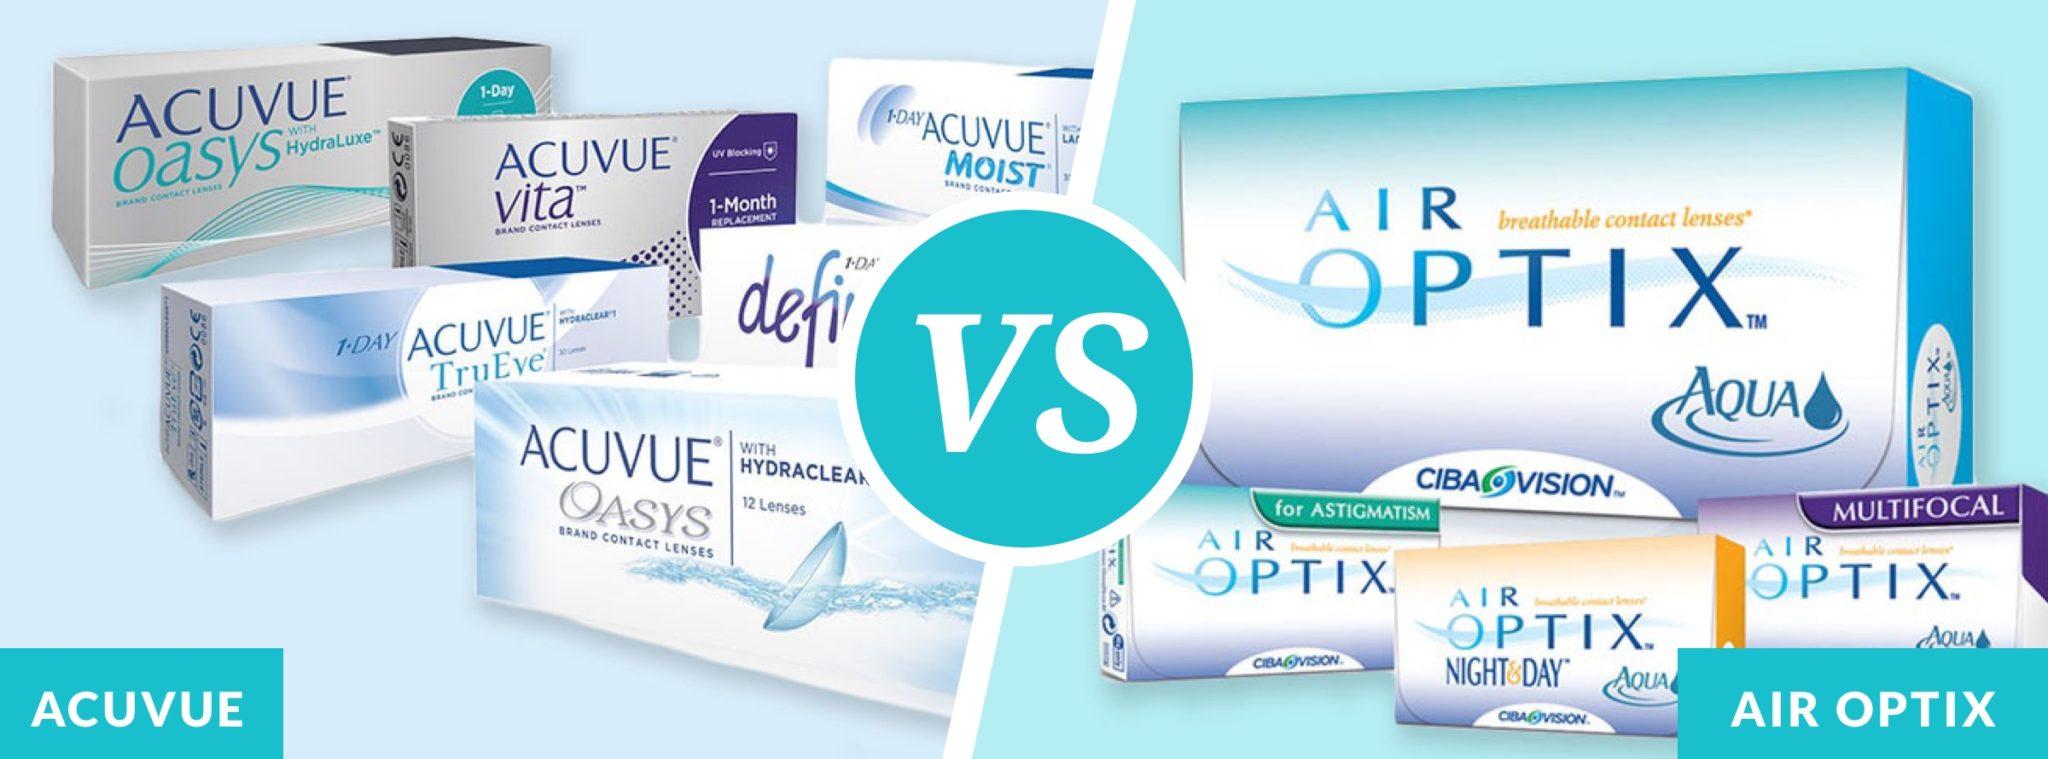 air optix vs acuvue contacts insider envy